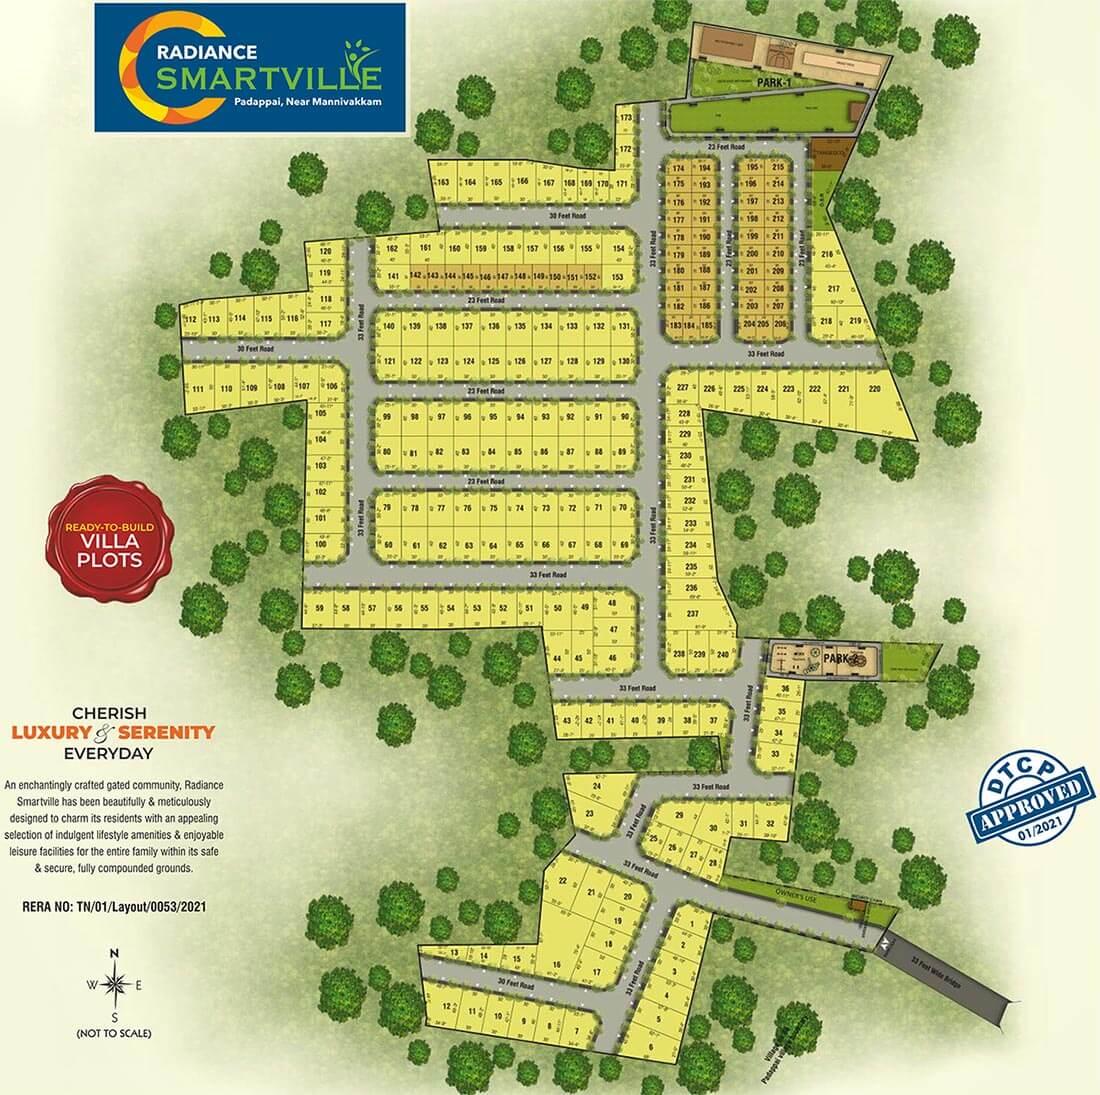 Master Plan - Radiance Smartville Plots